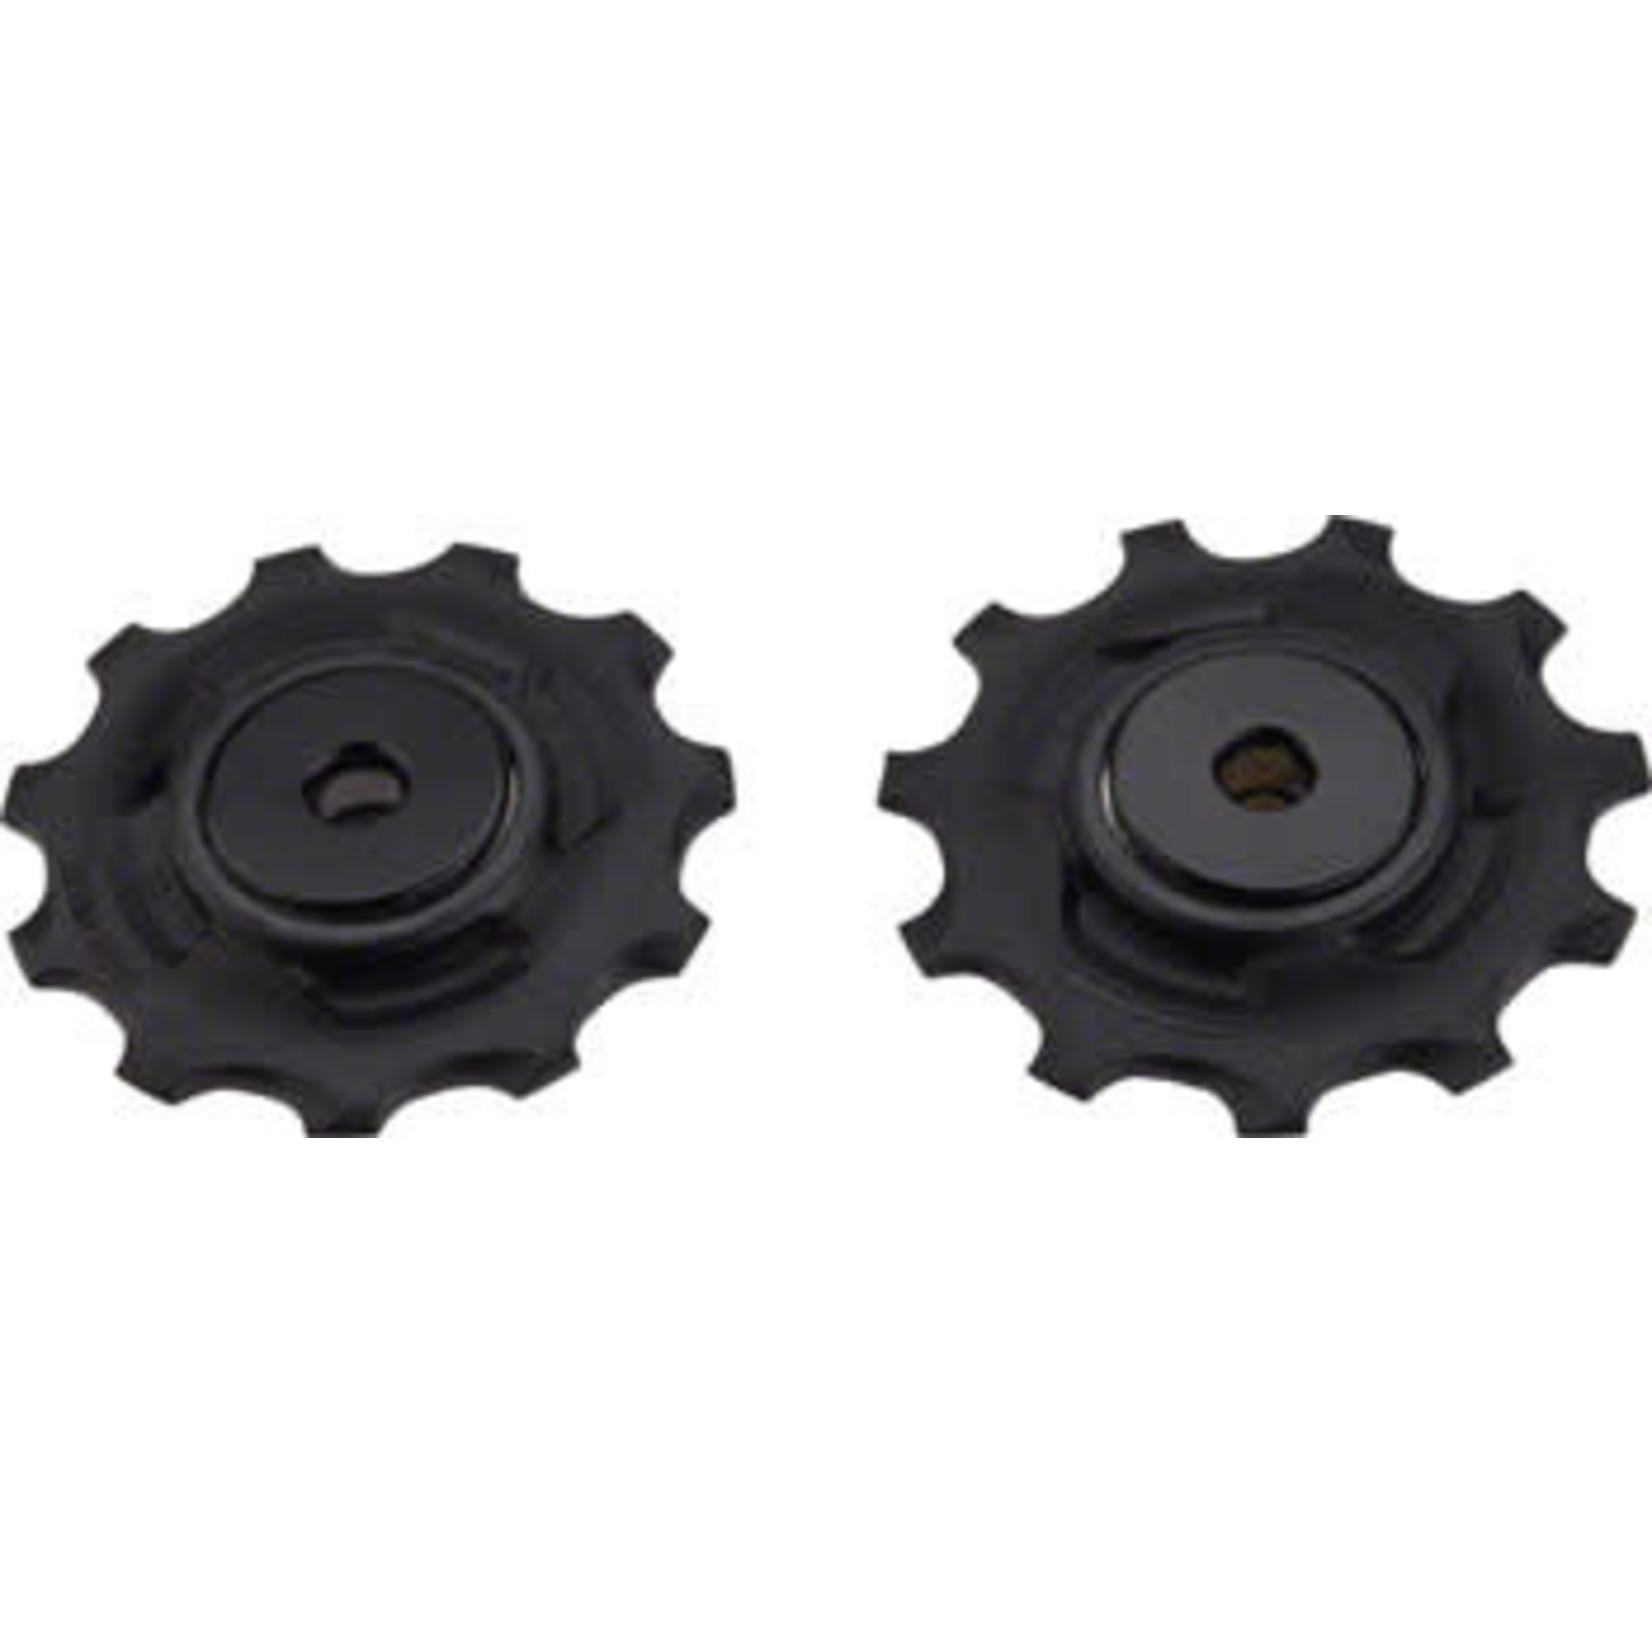 SRAM SRAM X9 and X7 Type2 Rear Derailleur Pulley Kit